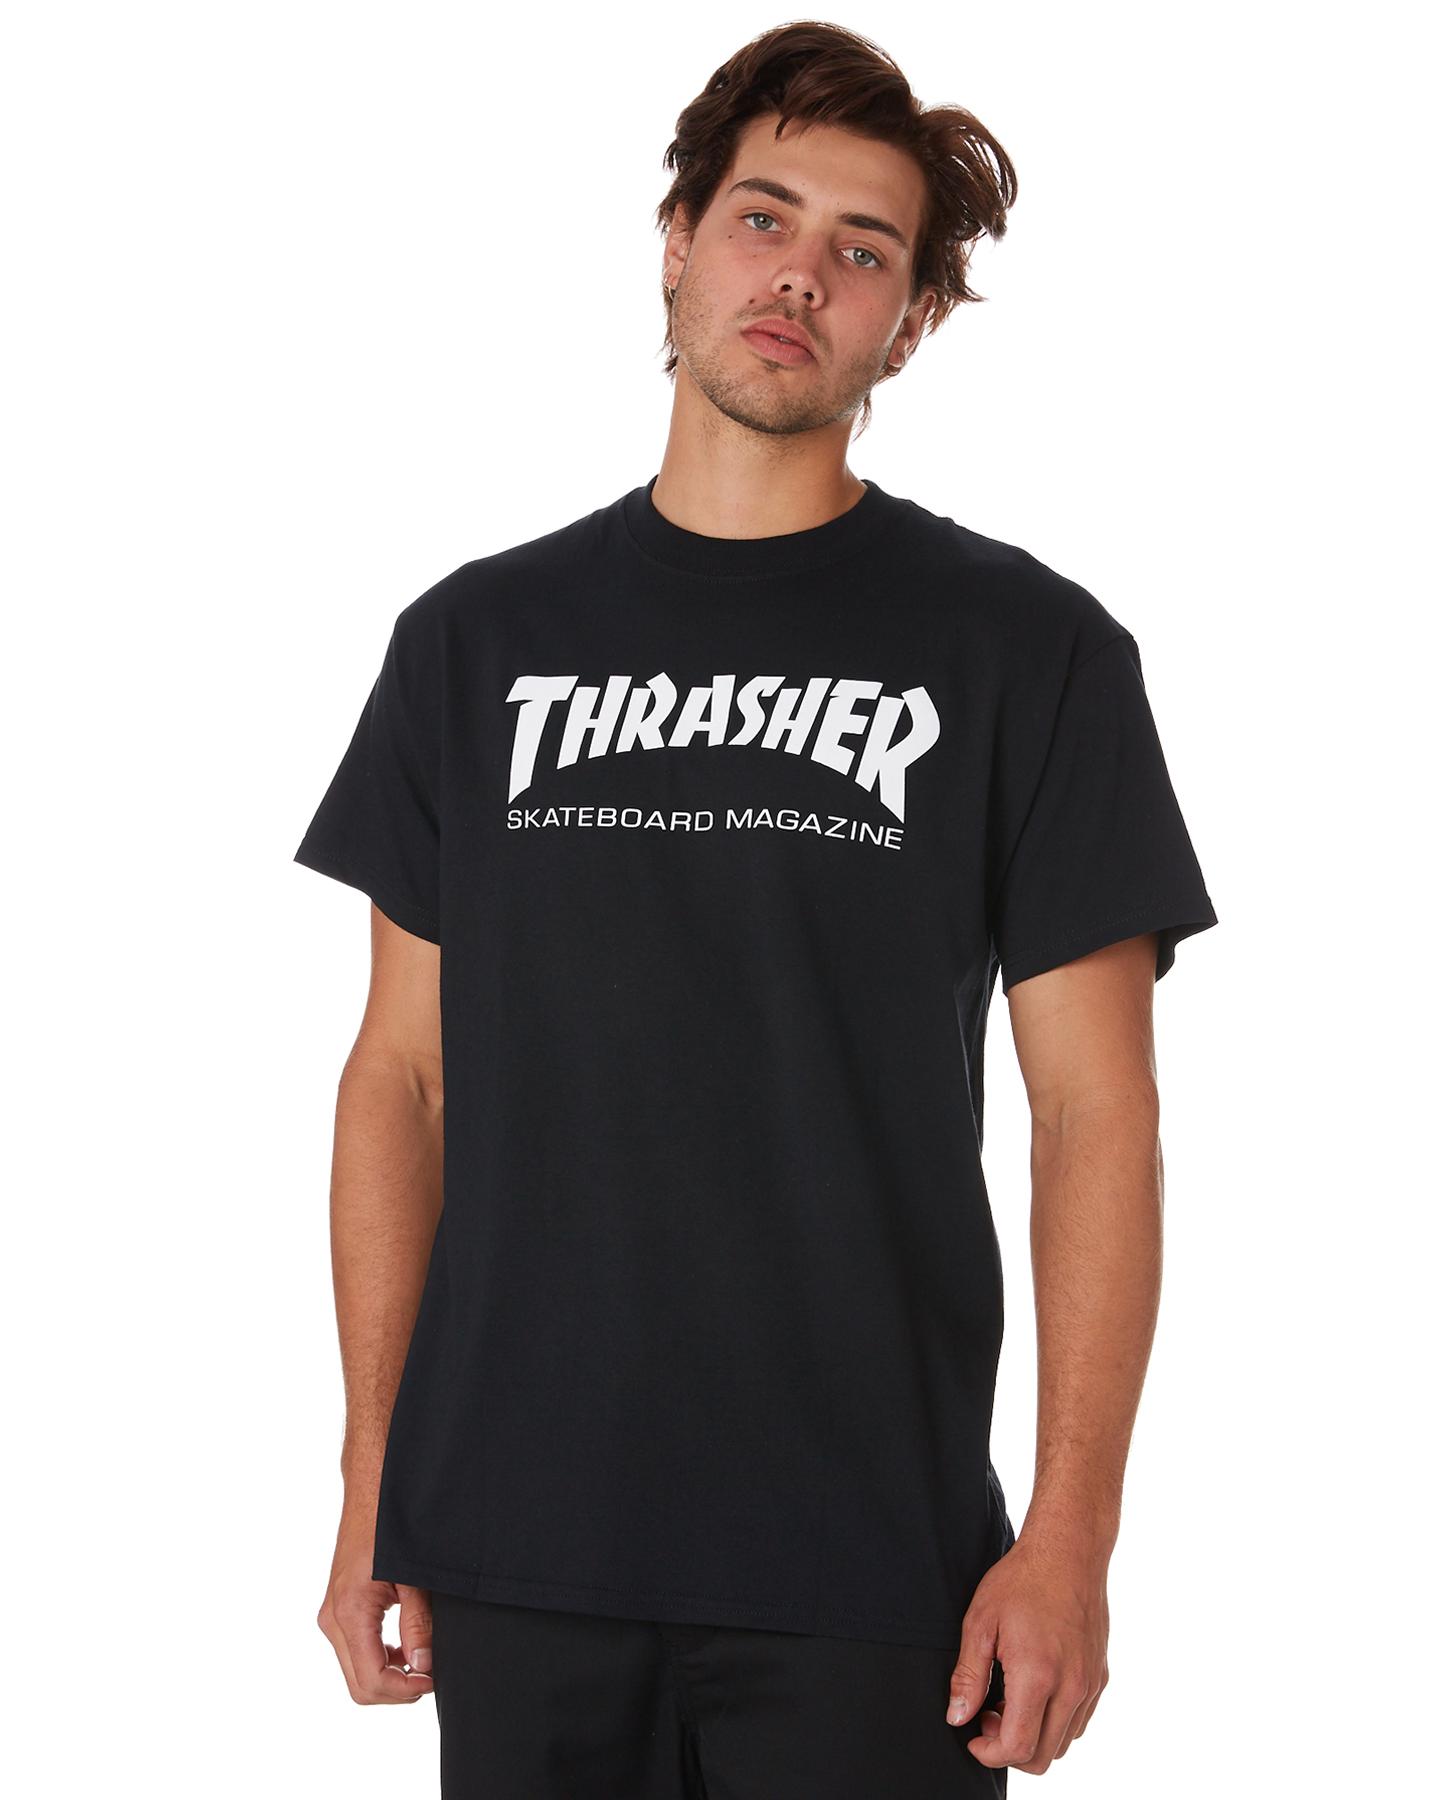 Thrasher Skate Mag Mens Tee Black 9339389472230